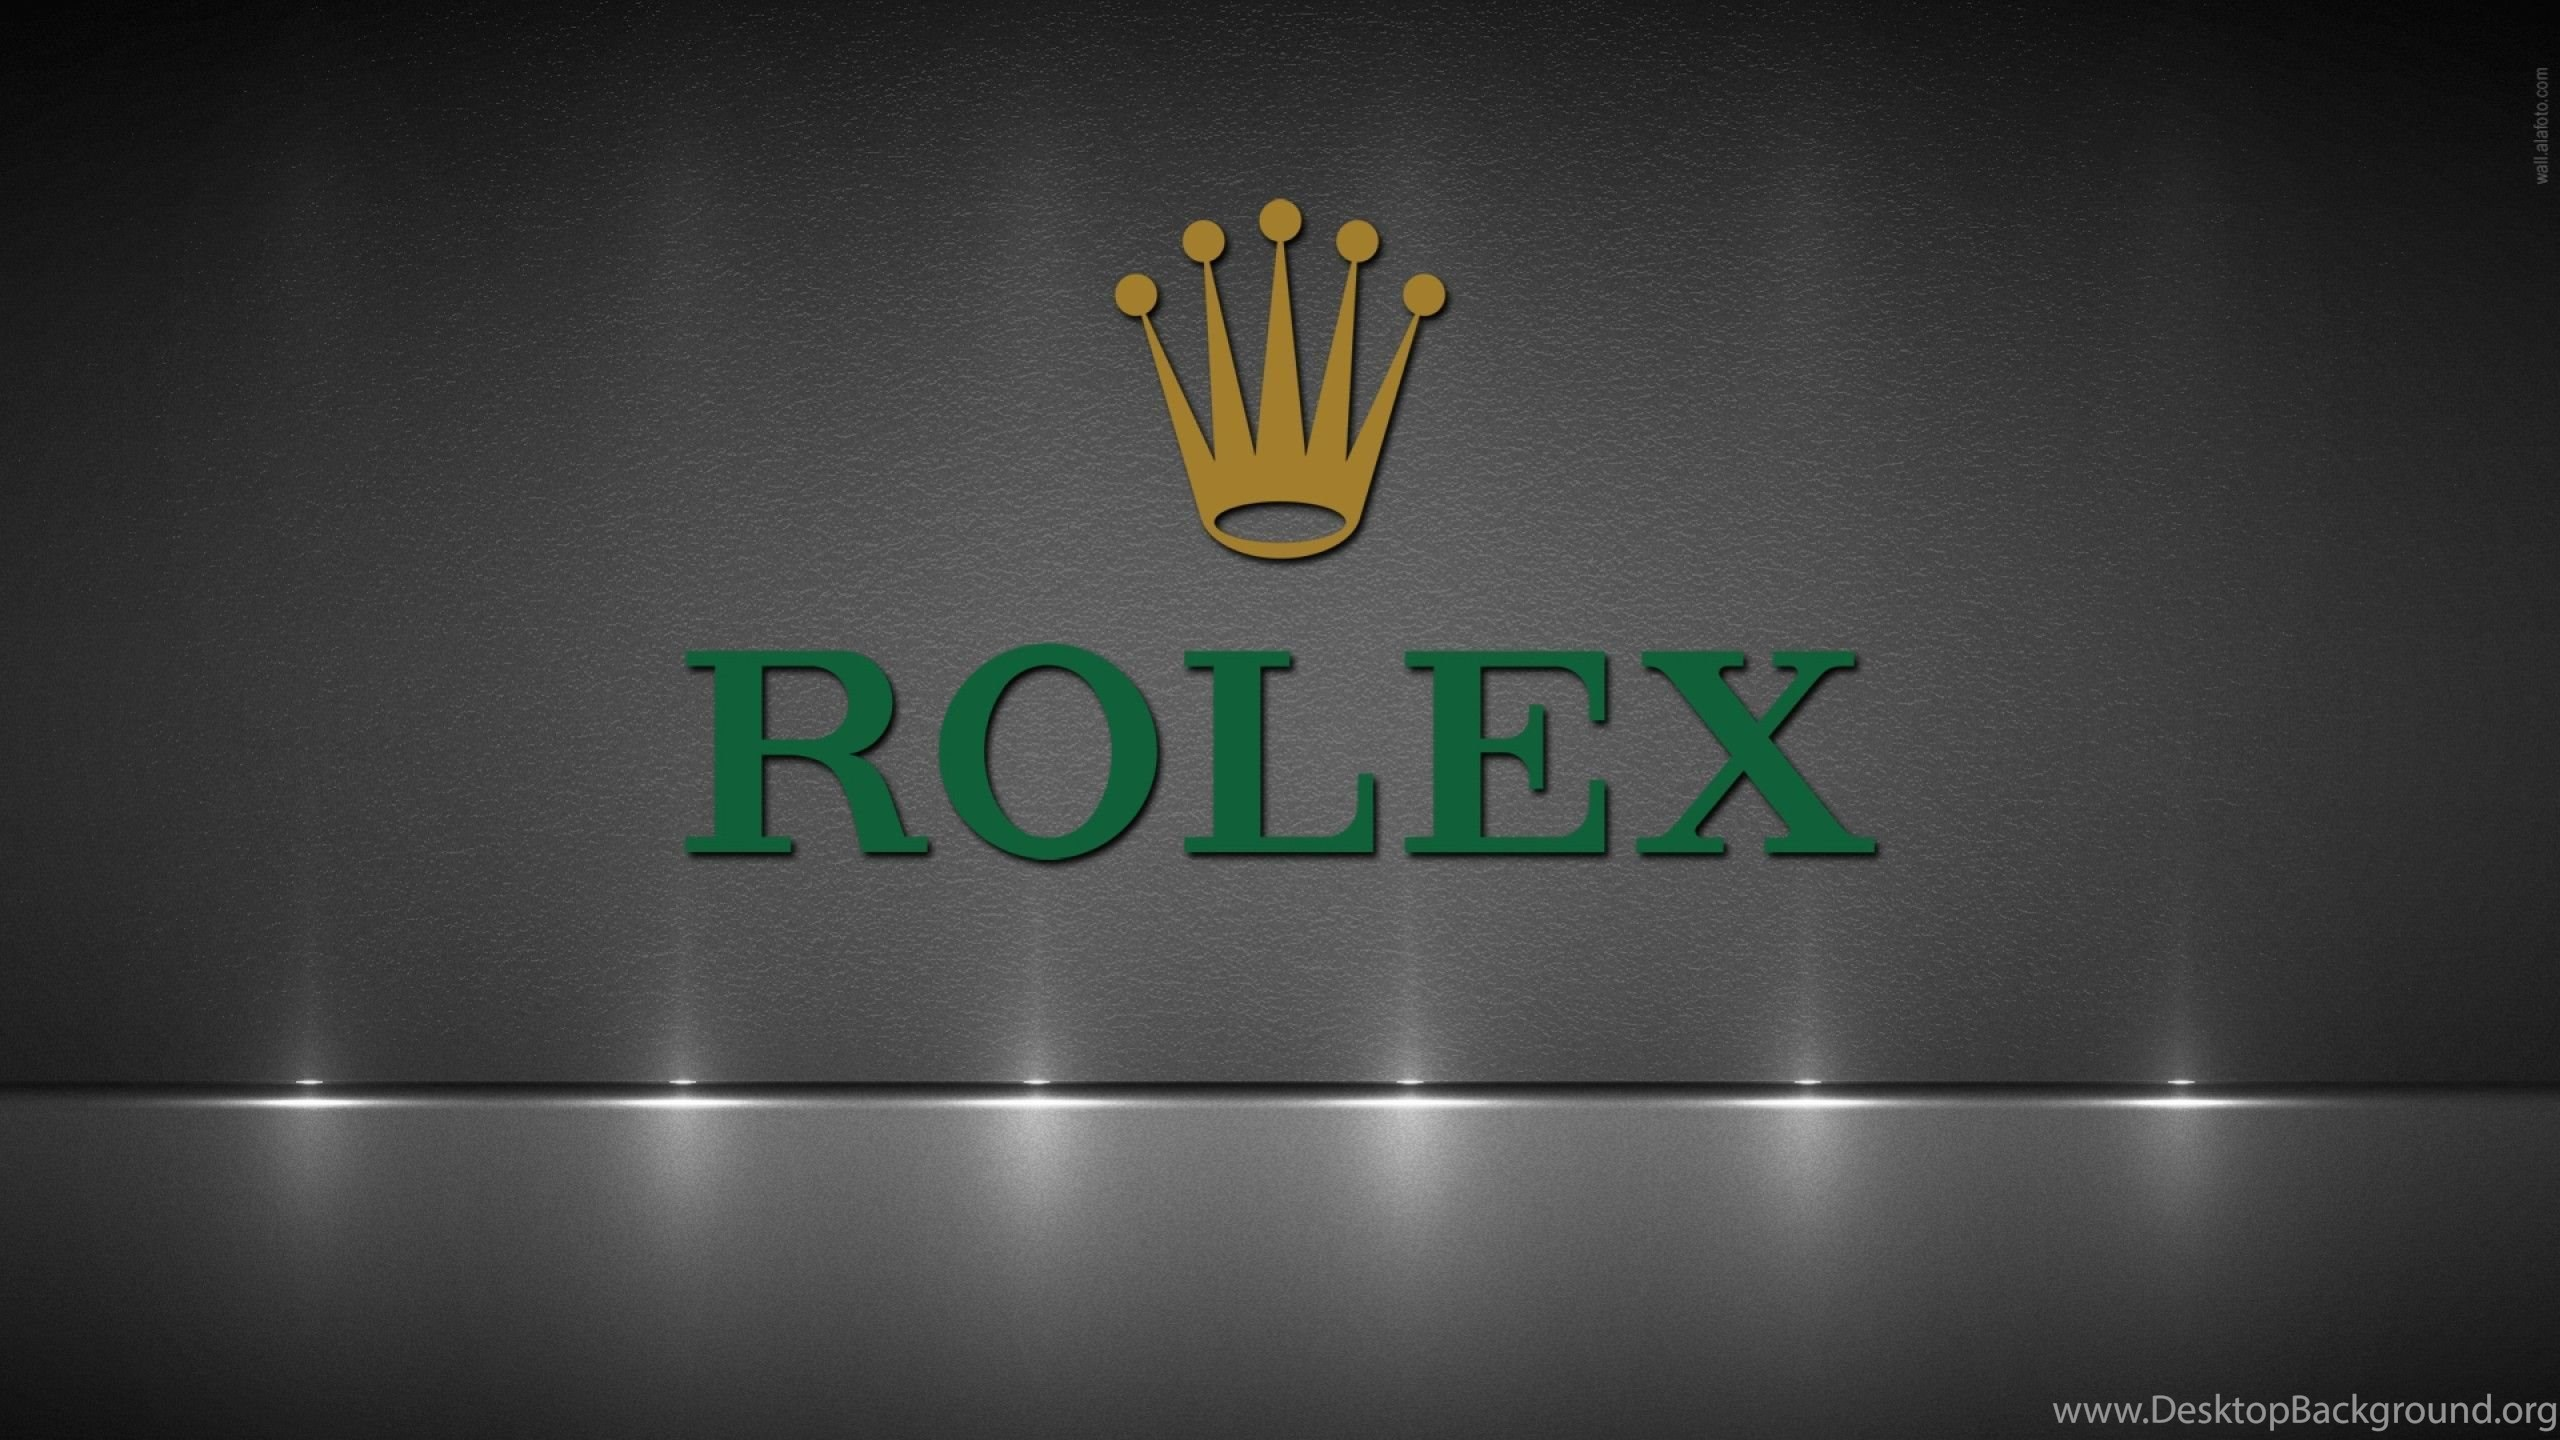 Best Rolex Wallpaper - 54451_rolex-logo-wallpapers-1920x1080-285-2560x1440_2560x1440_h Graphic_539779.jpg